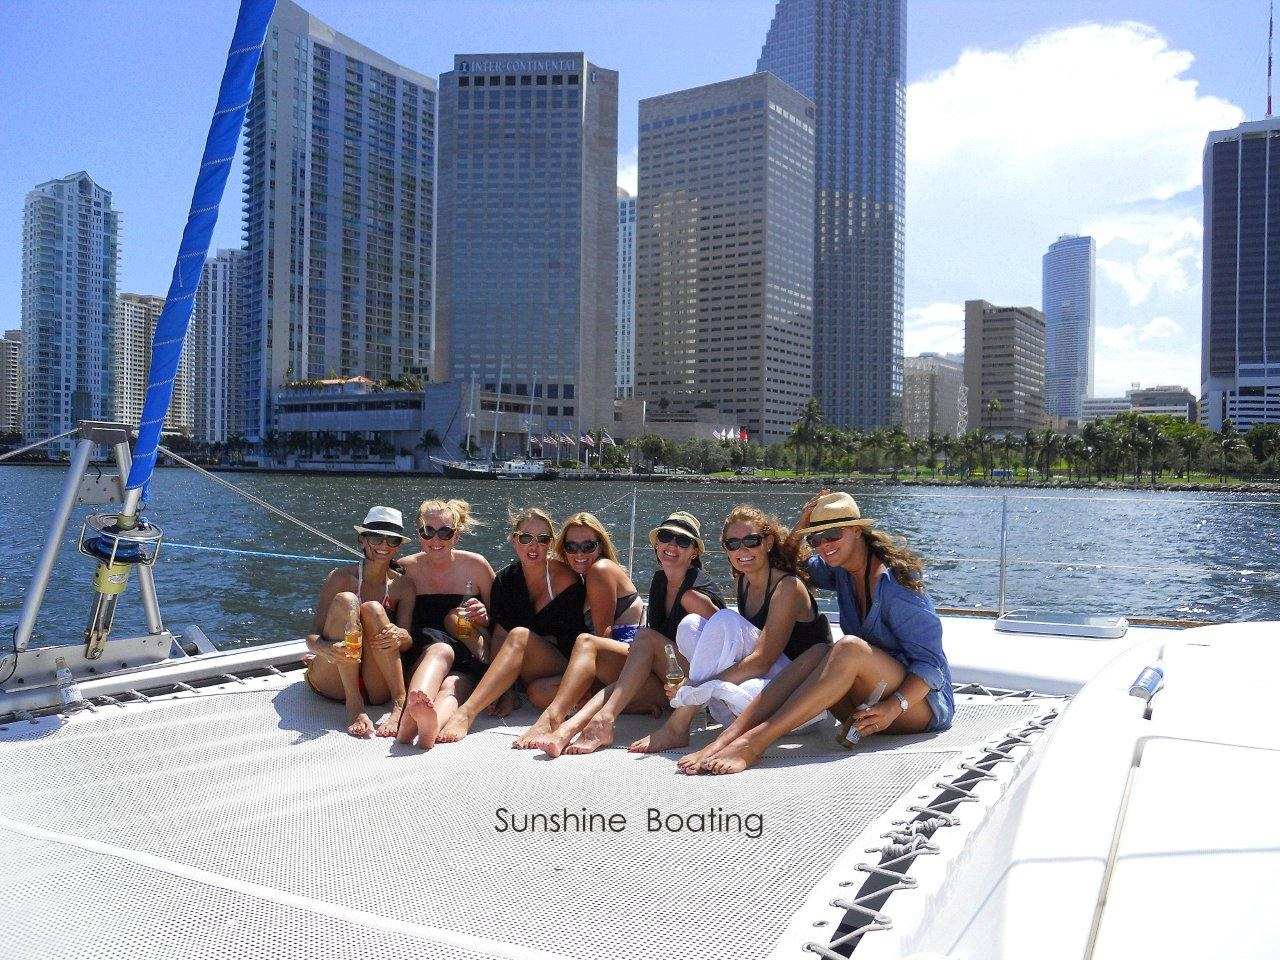 sunshine-boating-lagoon-41-d